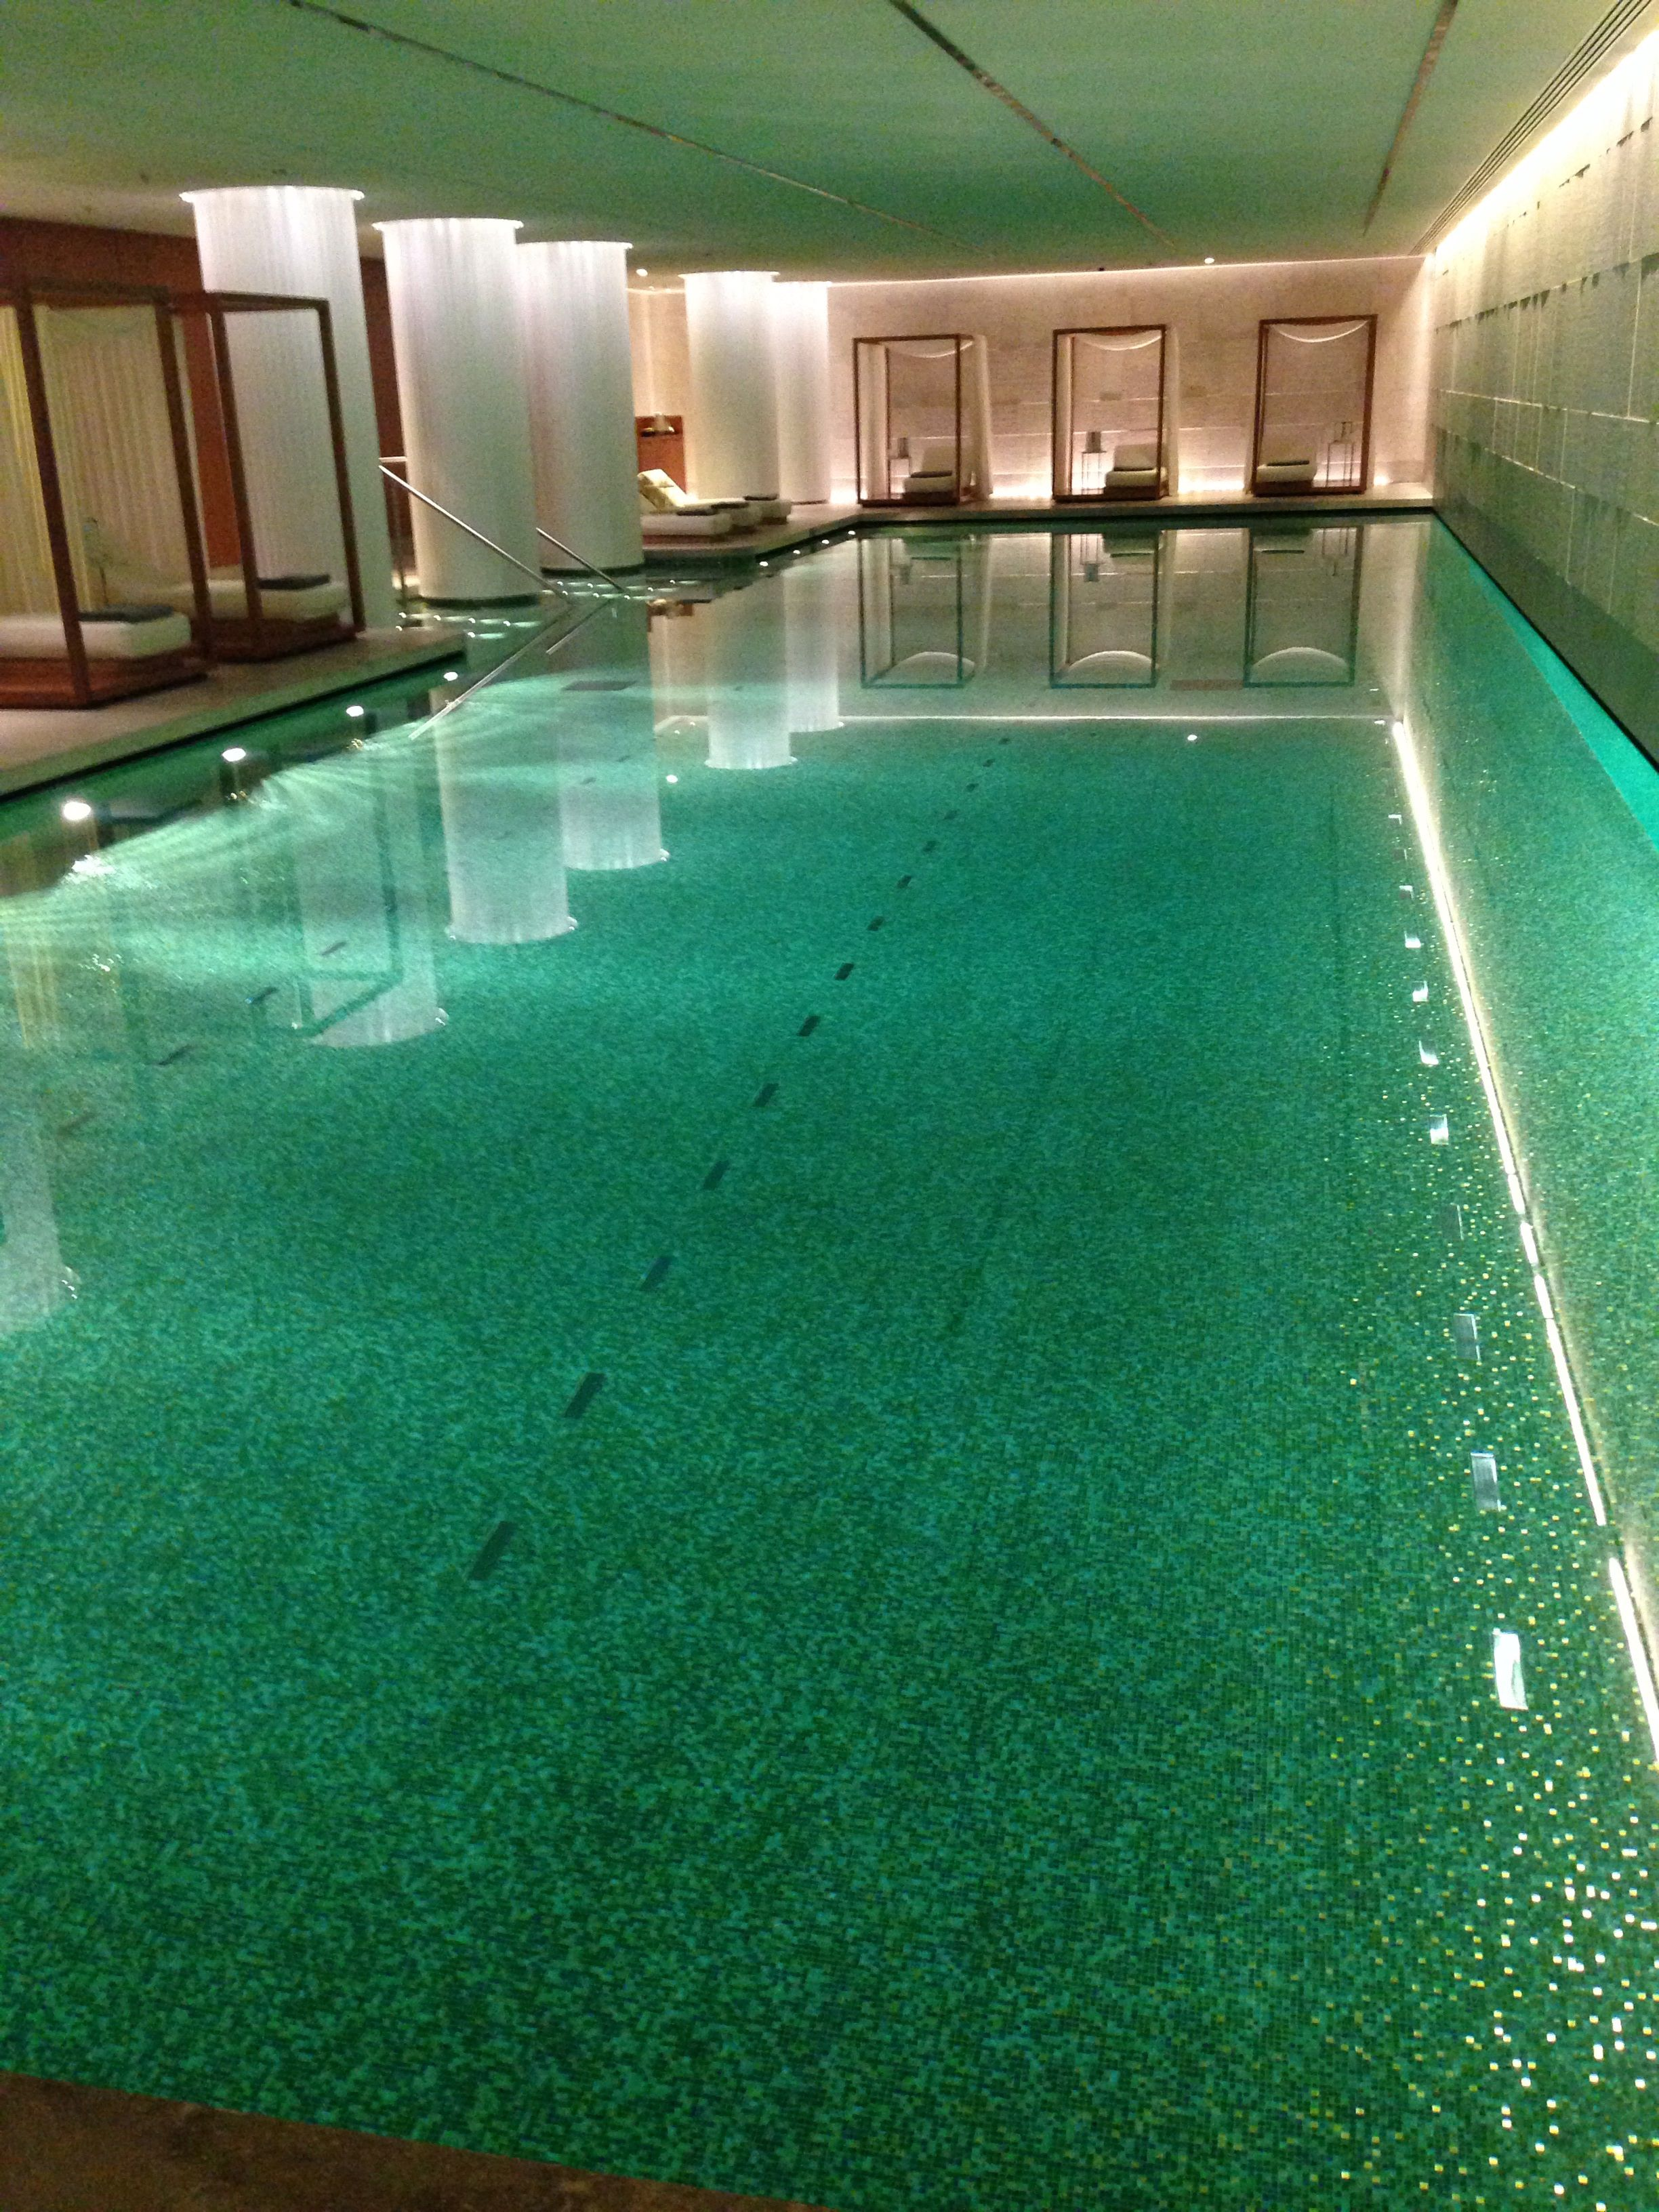 #bulgari Hotel And Spa #london Travels